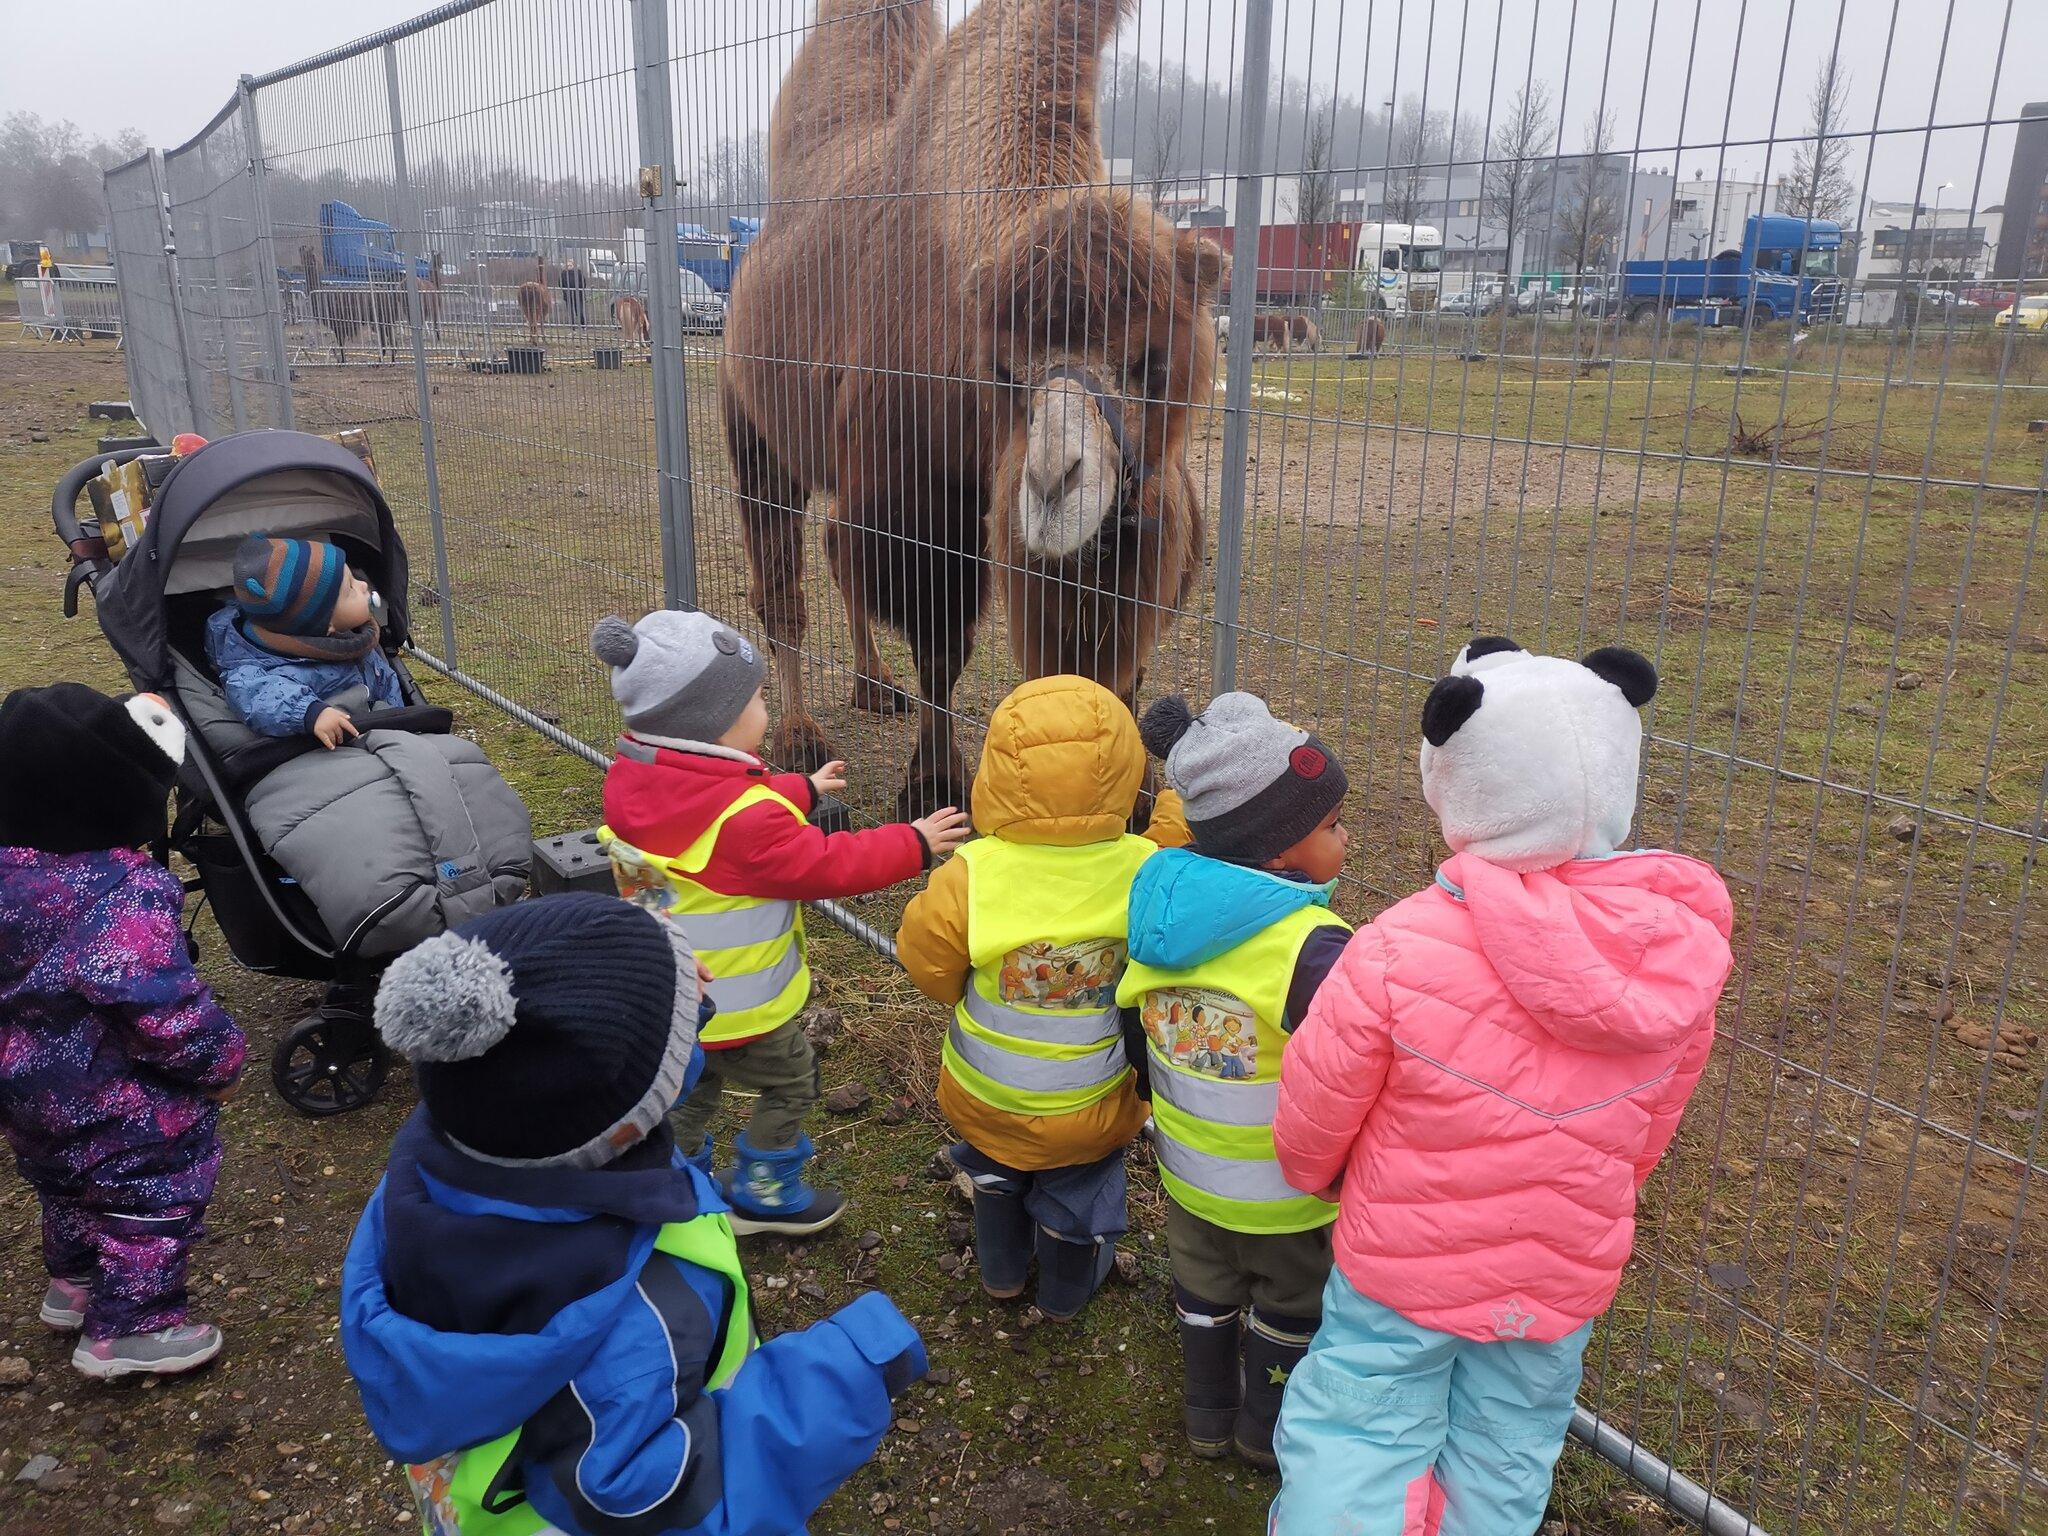 Circus Busch: Besuch bei den Circus Tieren (`,) -...